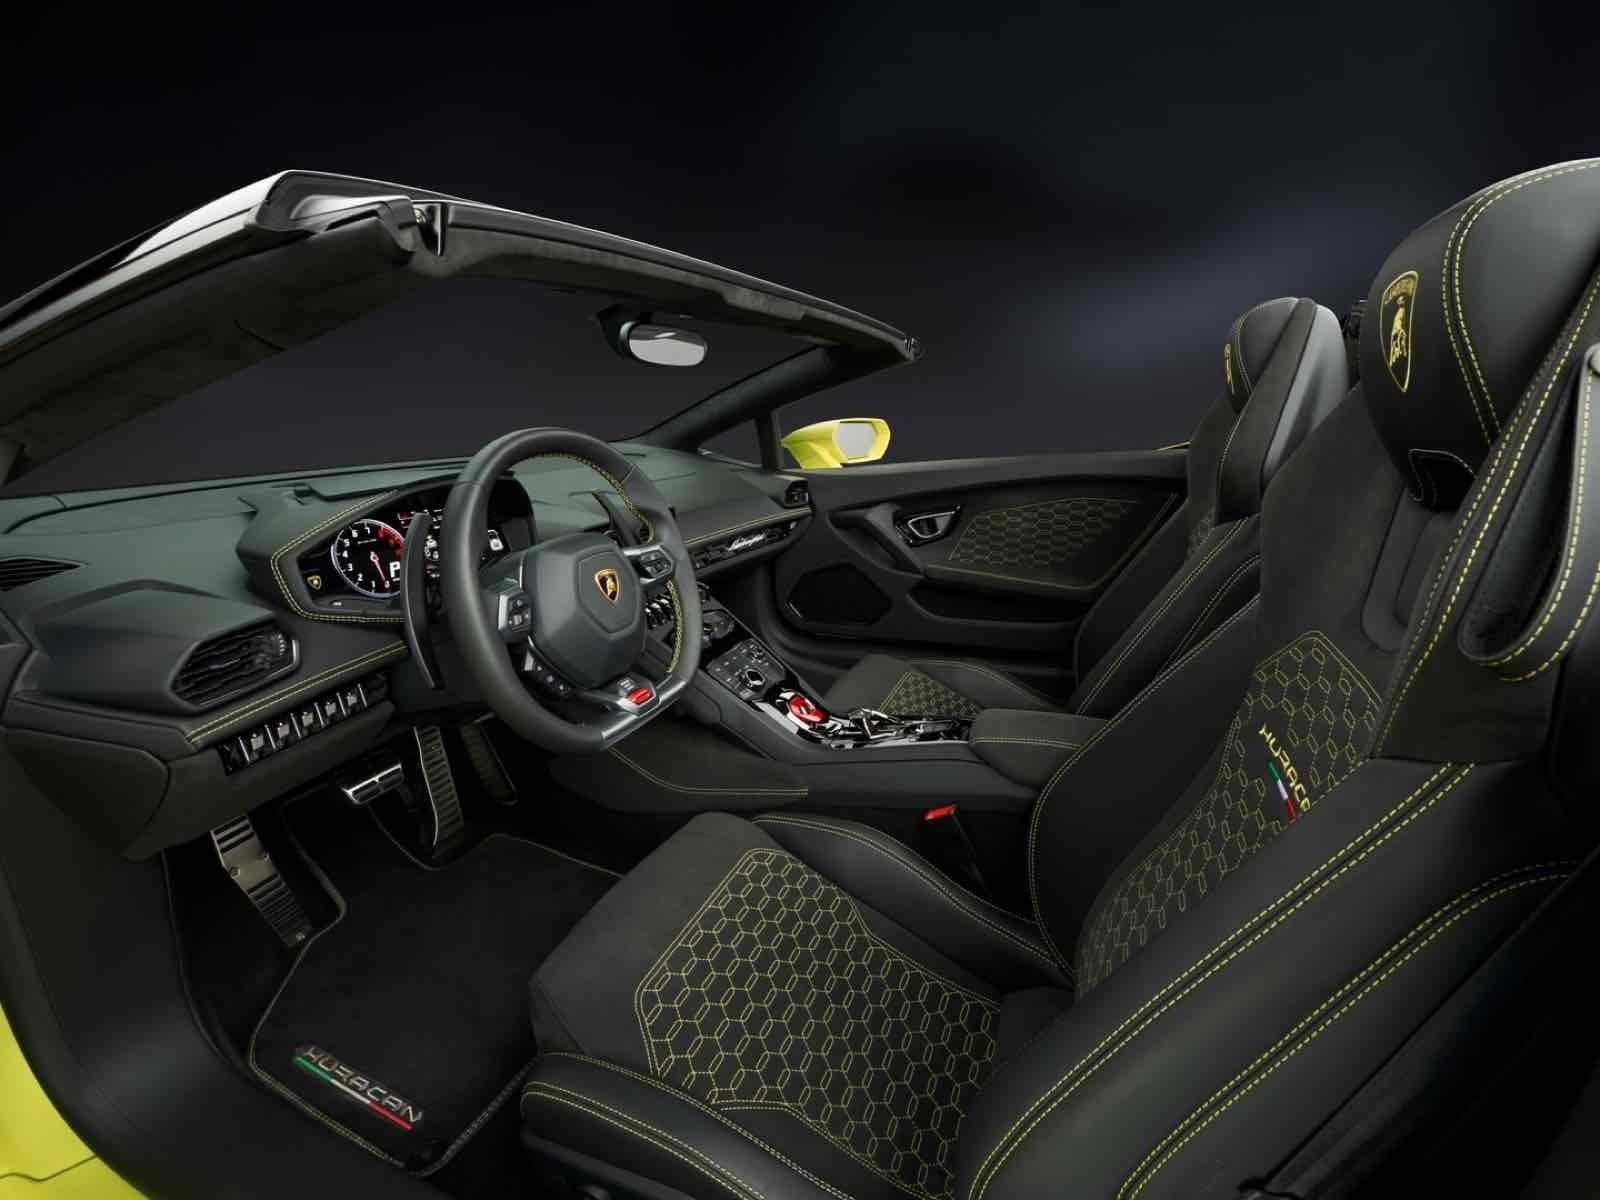 lamborghini hurac n lp 580 2 spyder ahora convertible. Black Bedroom Furniture Sets. Home Design Ideas